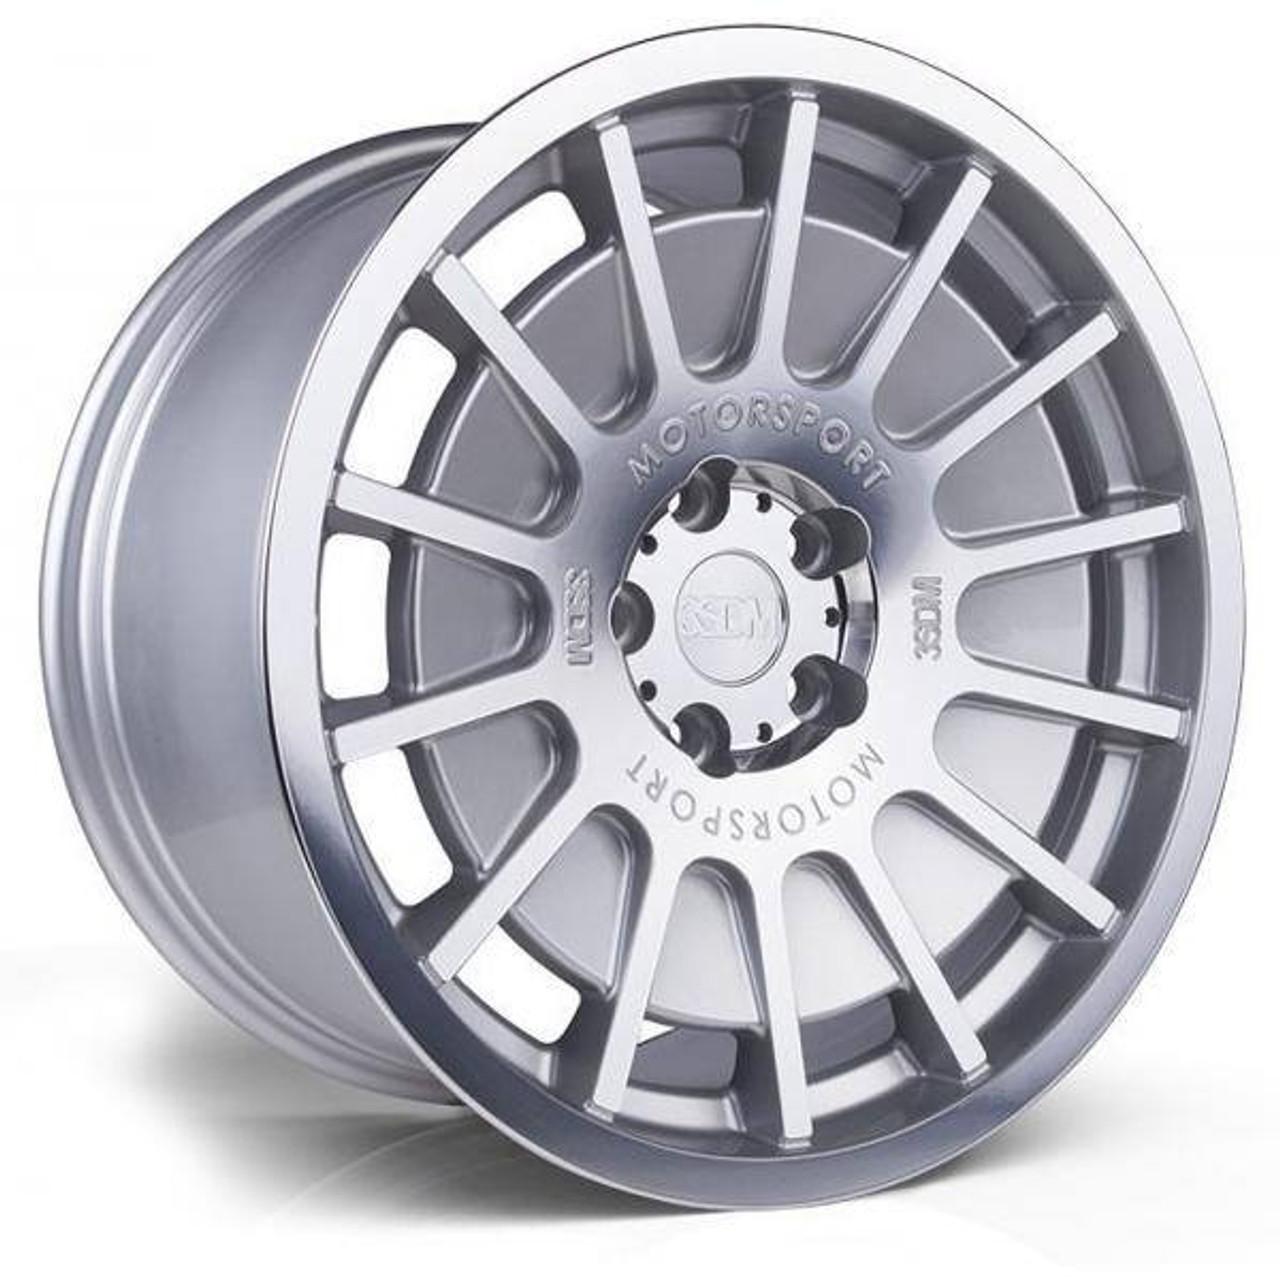 3SDM 0.66 Alloy Wheels Silver / Mirror Polished Face